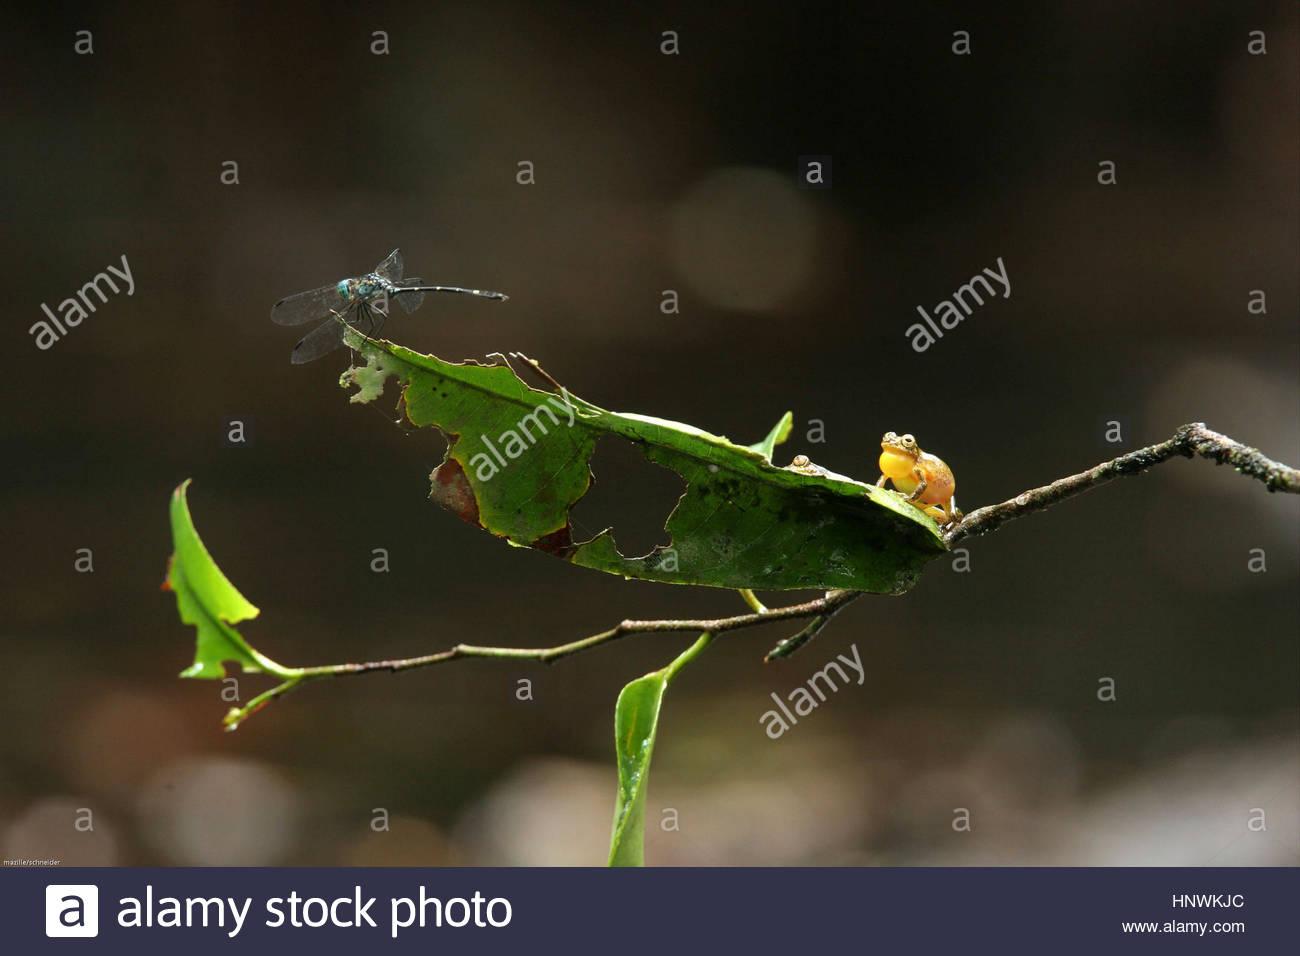 Hyla minuta frog on a leaf, Guyana. - Stock Image